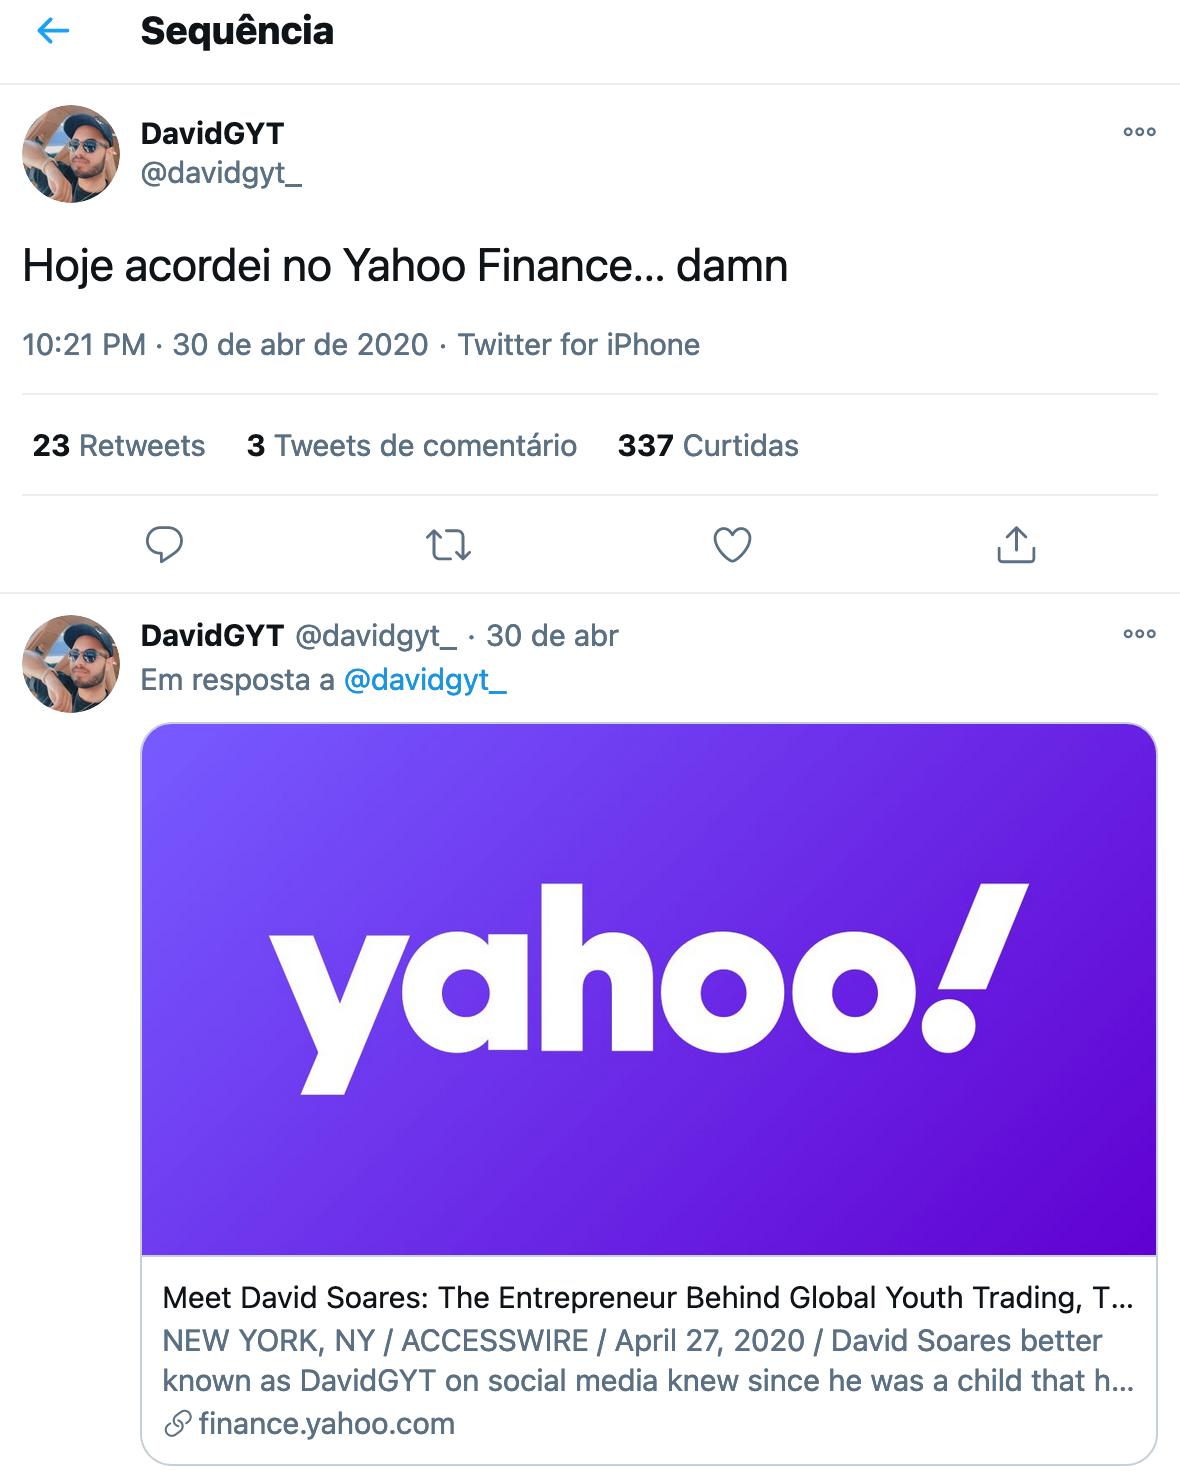 tweet DavidGYT